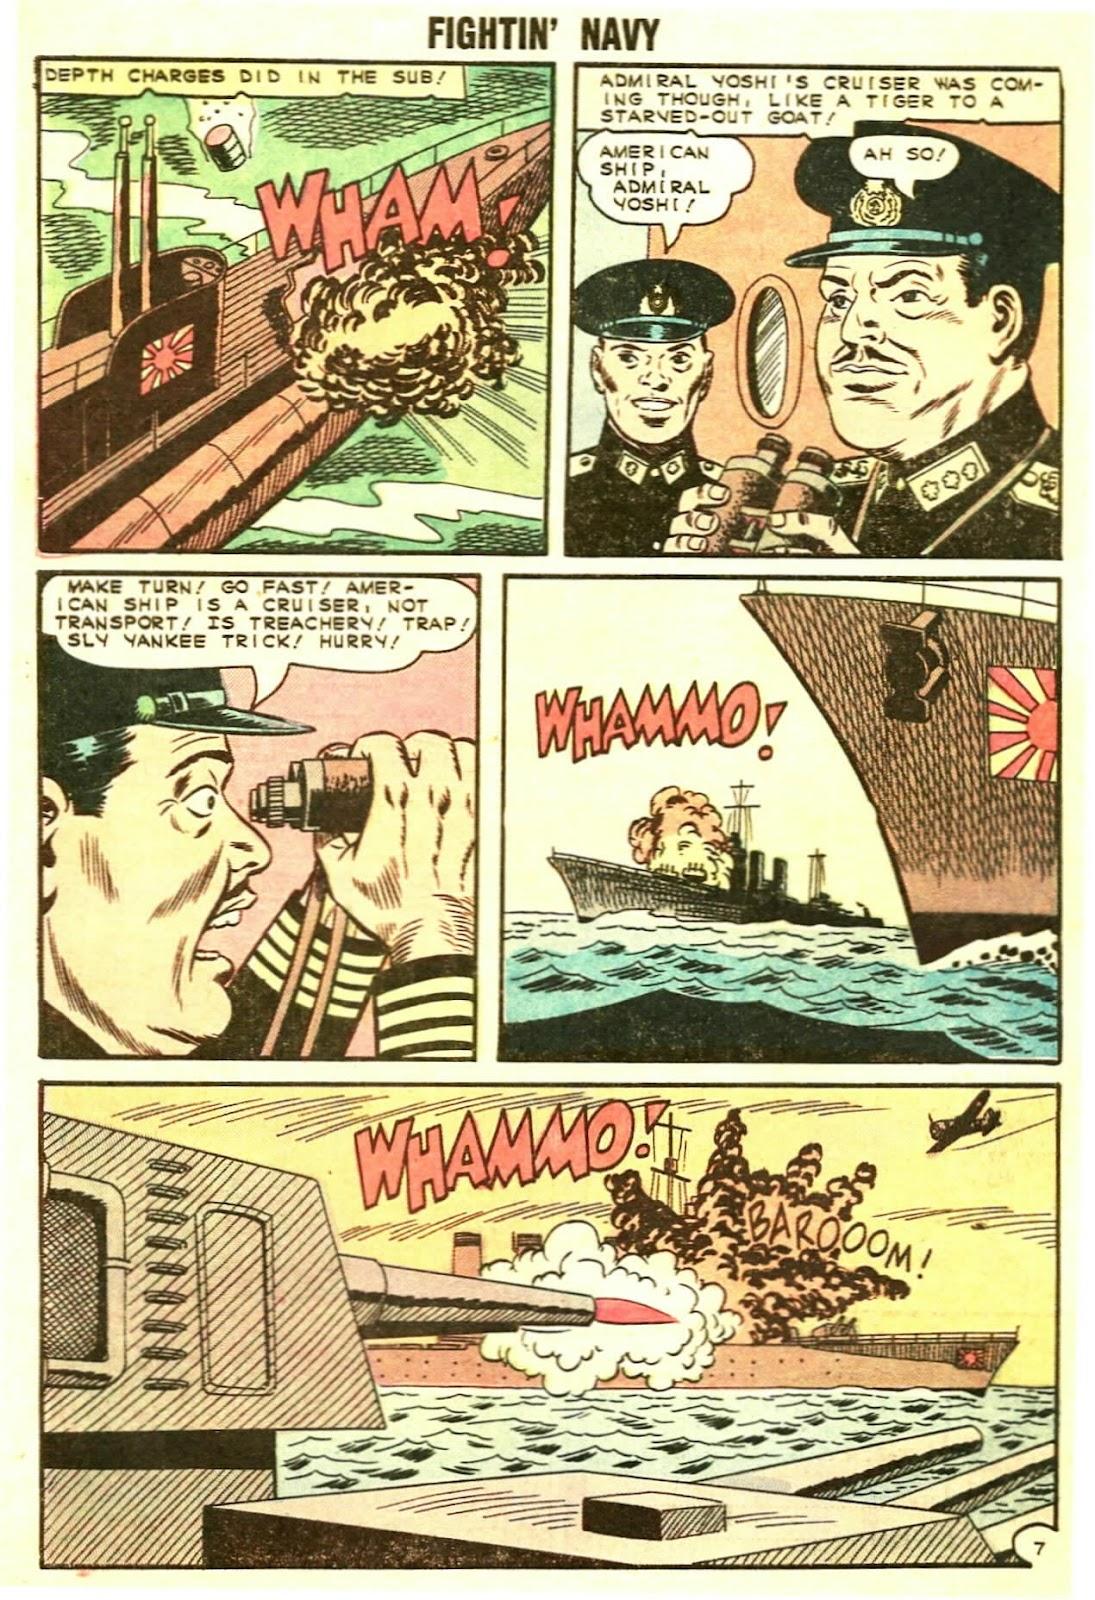 Read online Fightin' Navy comic -  Issue #119 - 32